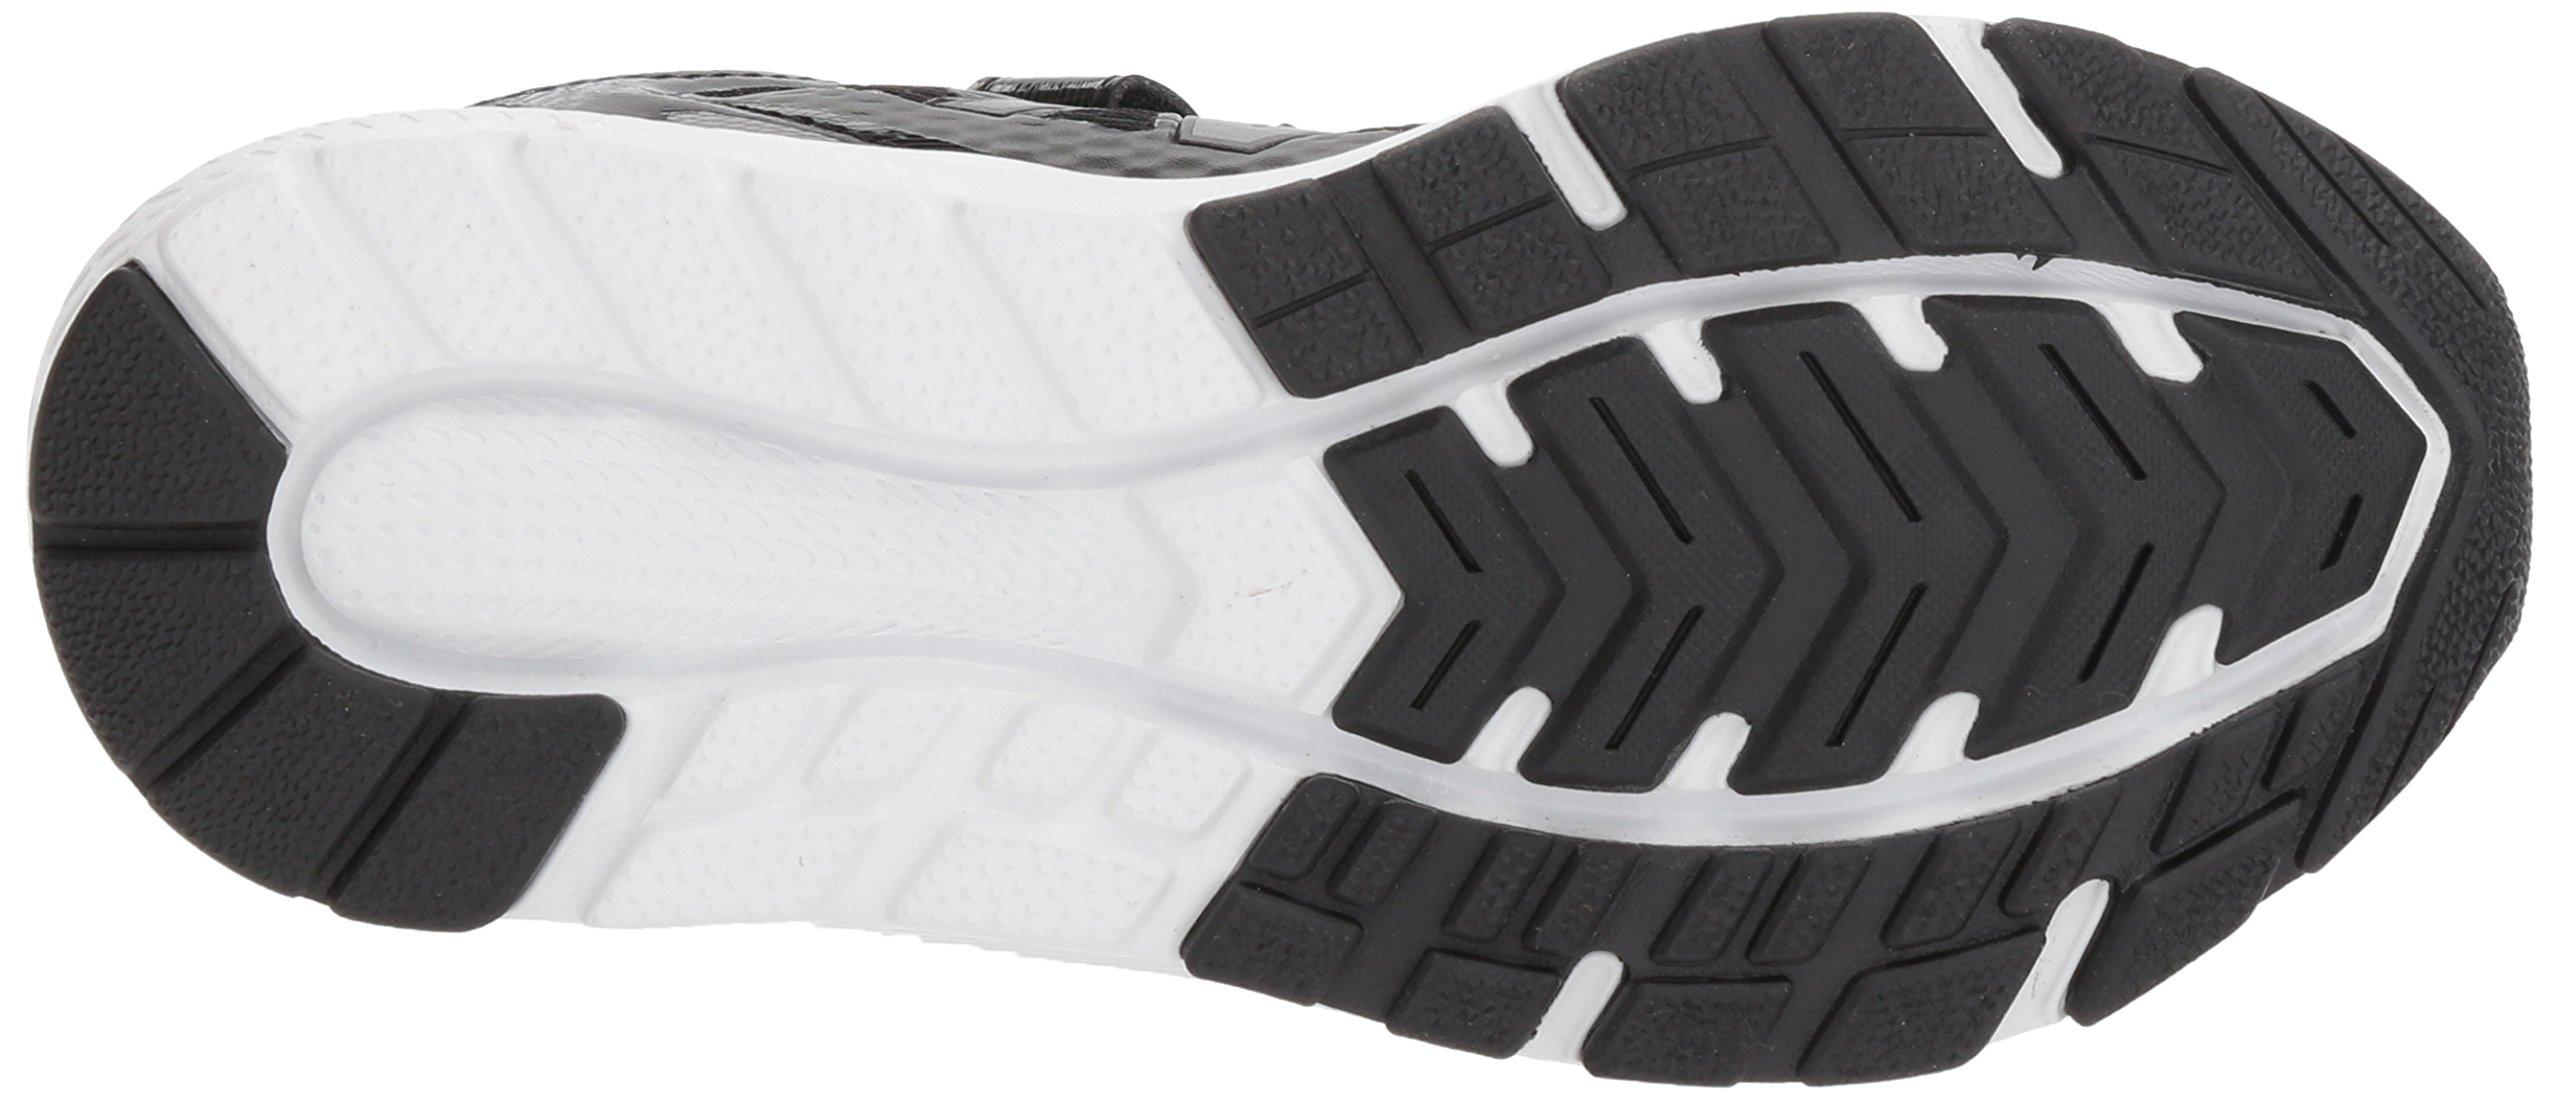 New Balance Boys' 519v1 Hook and Loop Running Shoe Black/White 2 M US Infant by New Balance (Image #3)